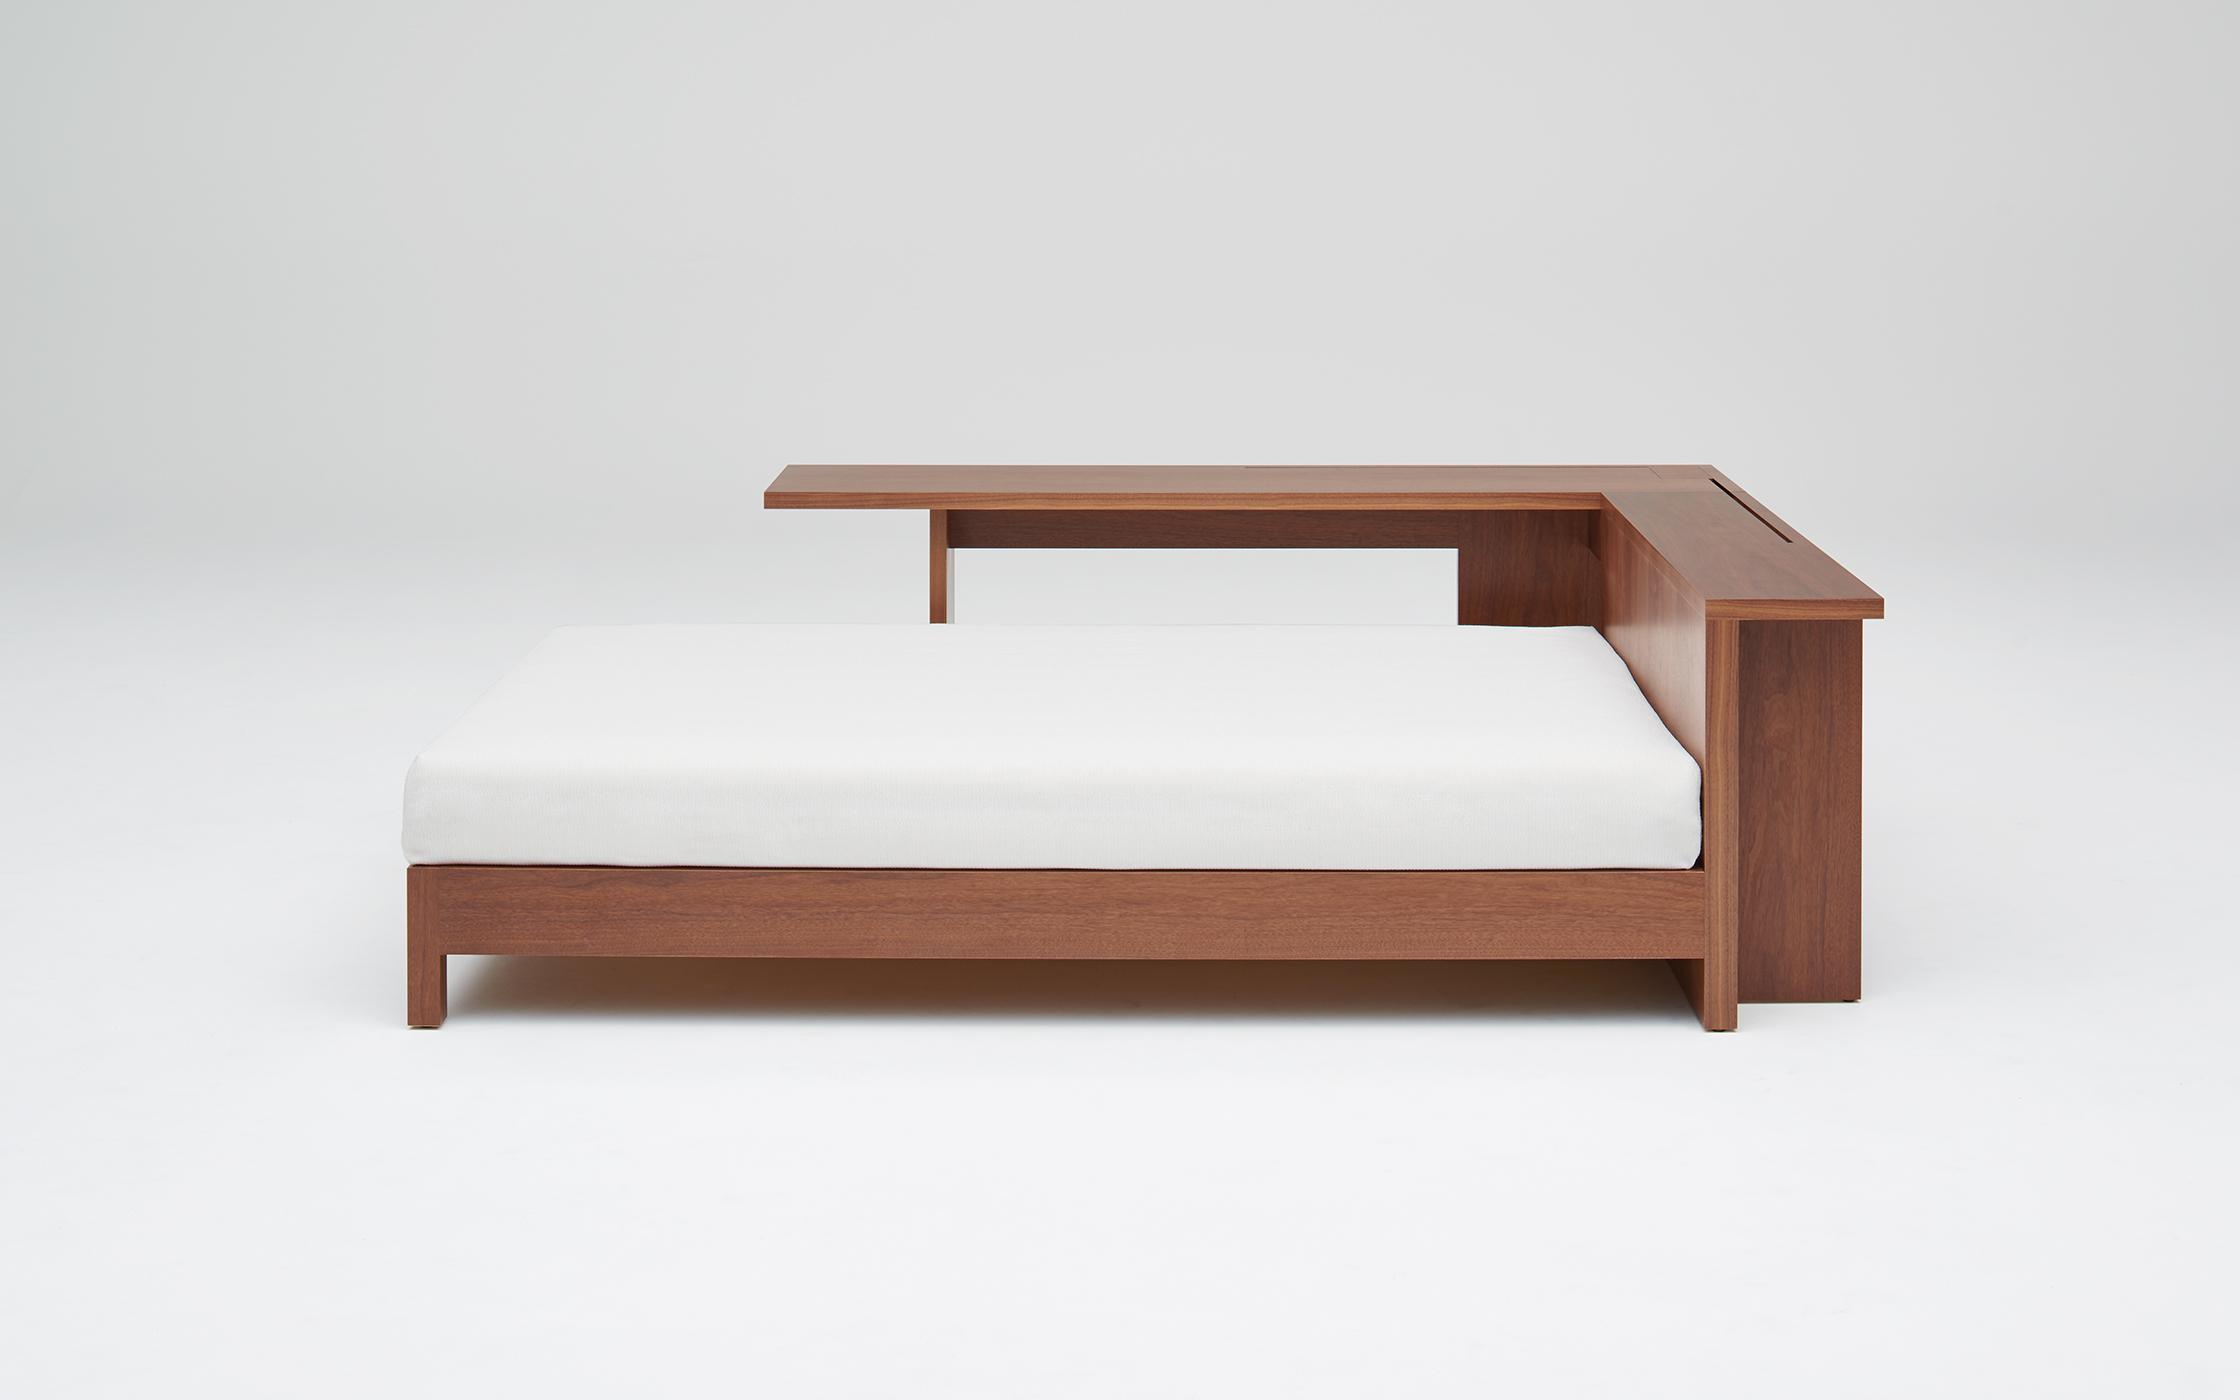 Omni-directional furniture